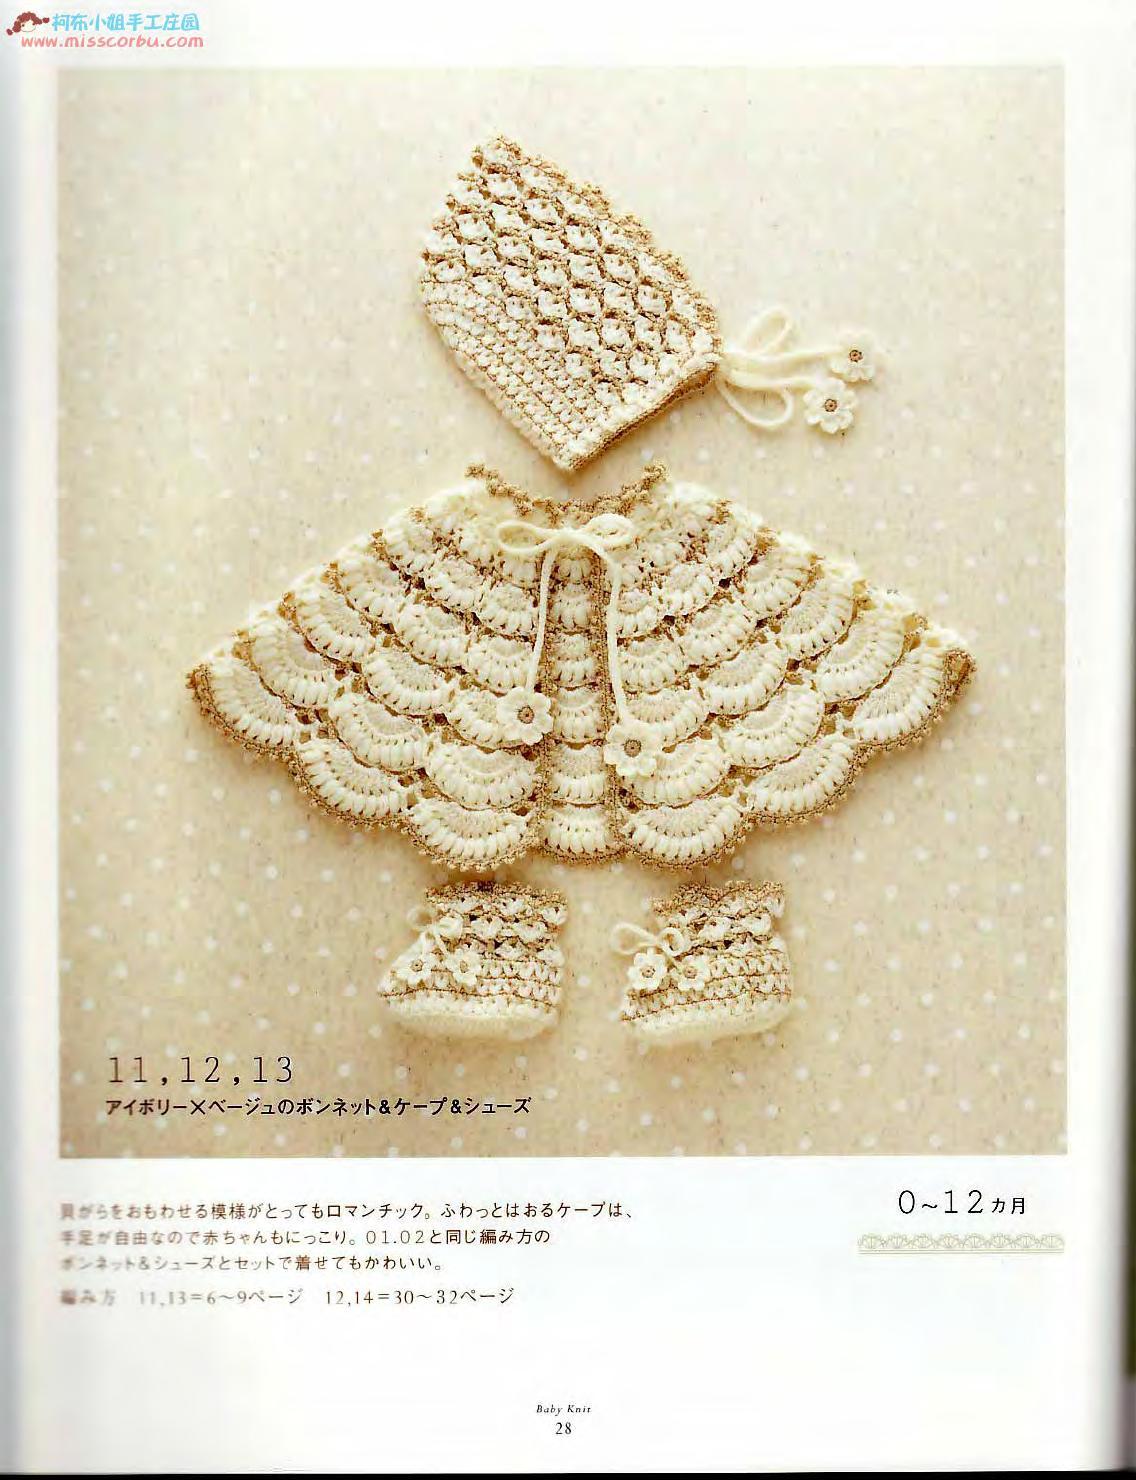 PATRONES GRATIS DE CROCHET: PONCHO en ondas para BEBE a crochet ...